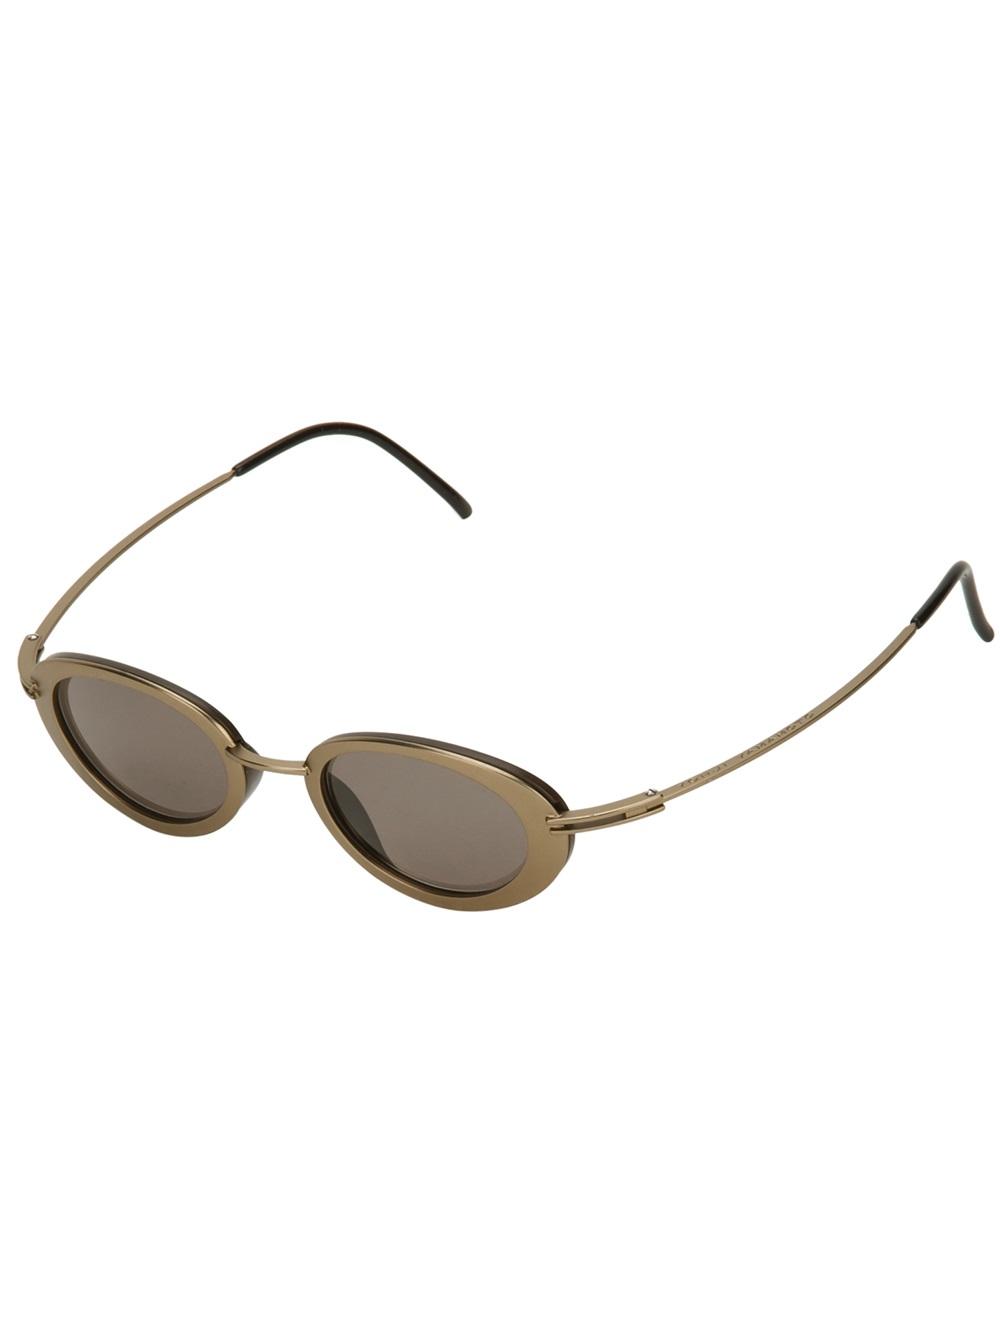 Gold Frame Oval Sunglasses : Yohji Yamamoto Oval Frame Sunglasses in Brown (gold) Lyst